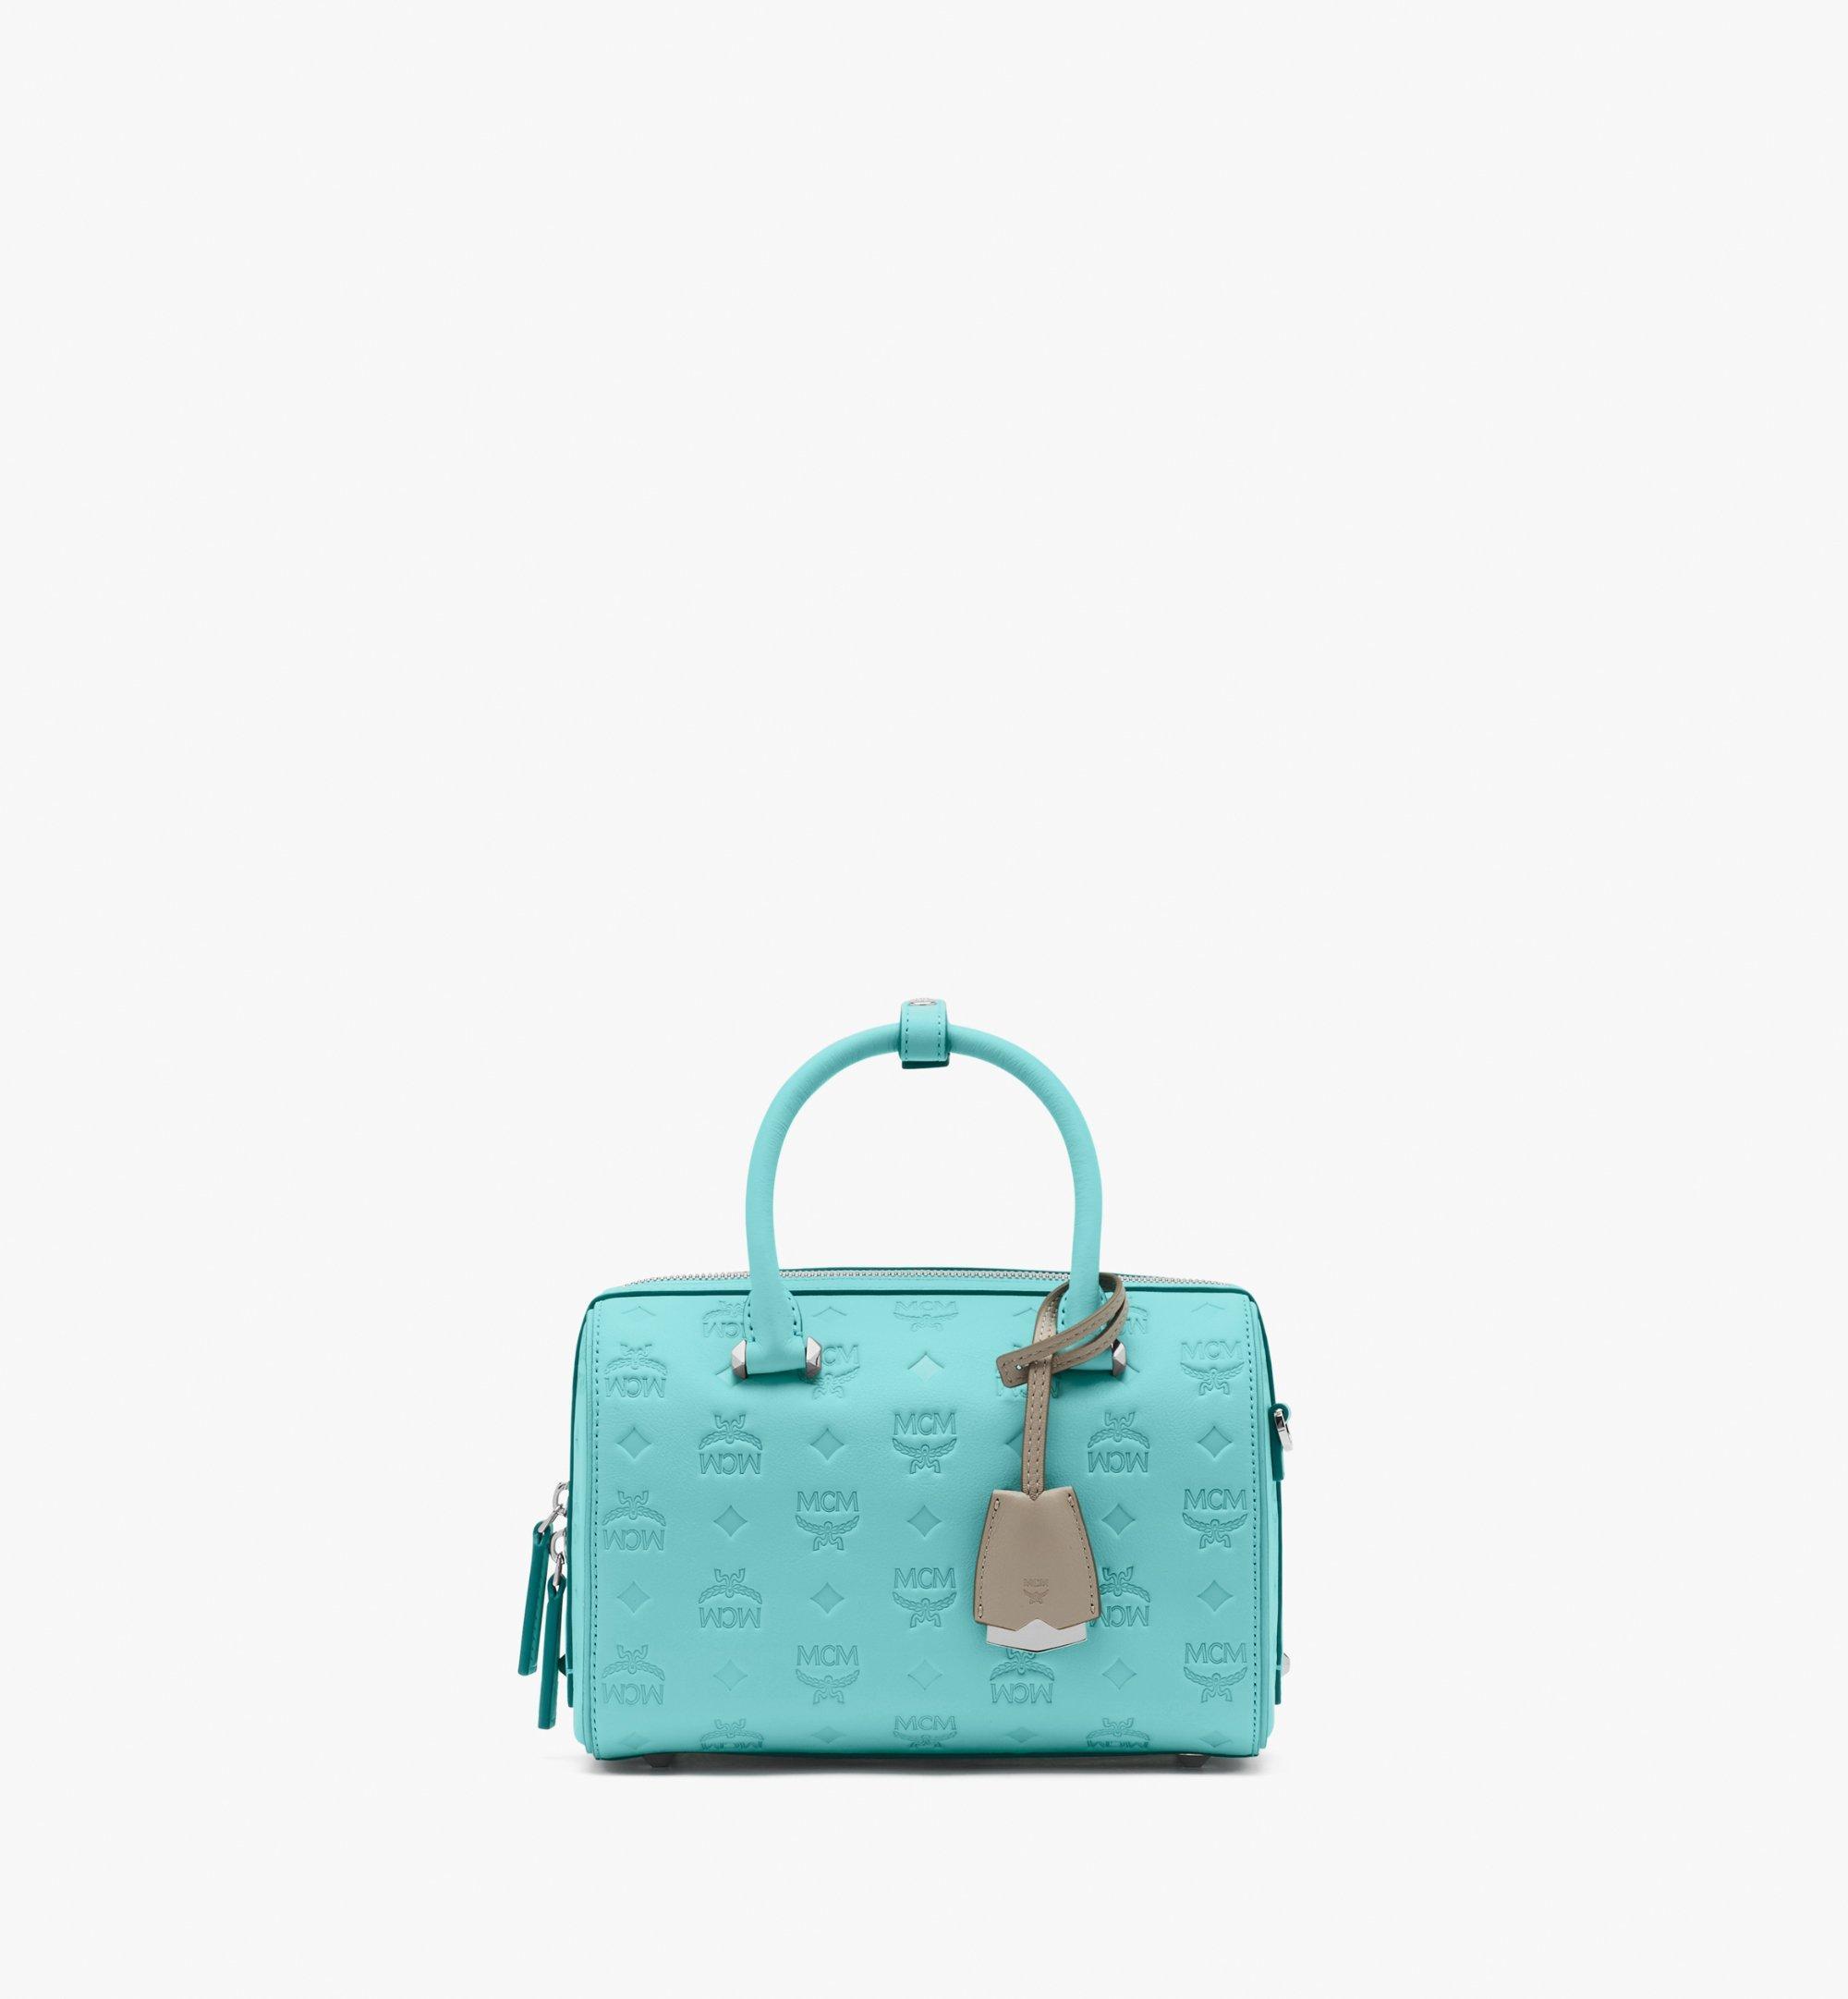 23 cm 9 in Essential Boston Bag in Monogram Leather Pool